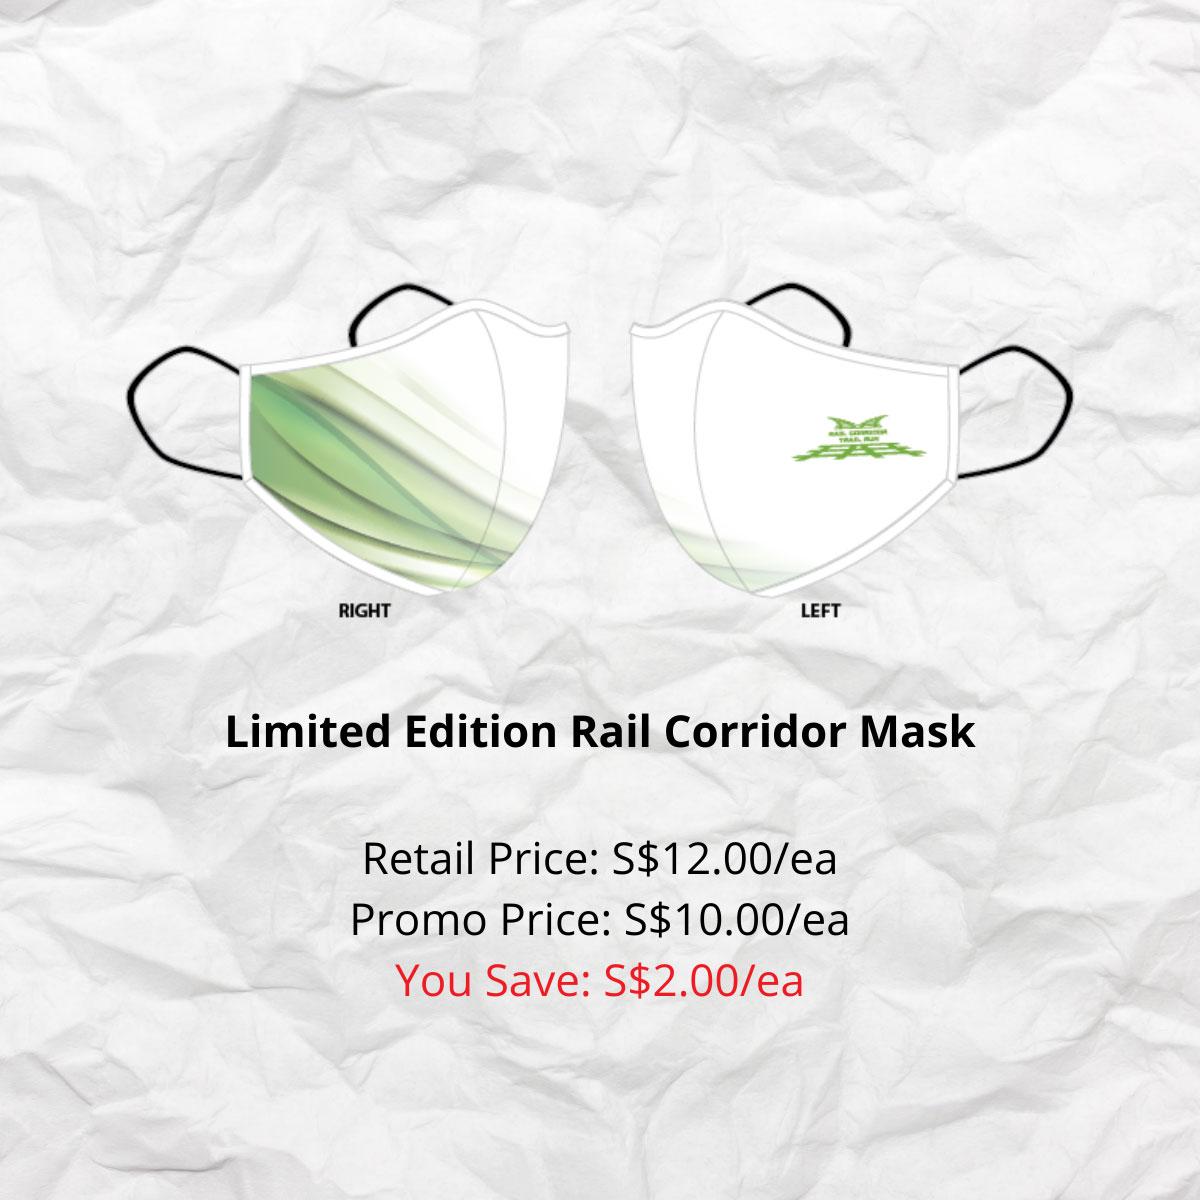 Limited Edition Rail Corridor Mask